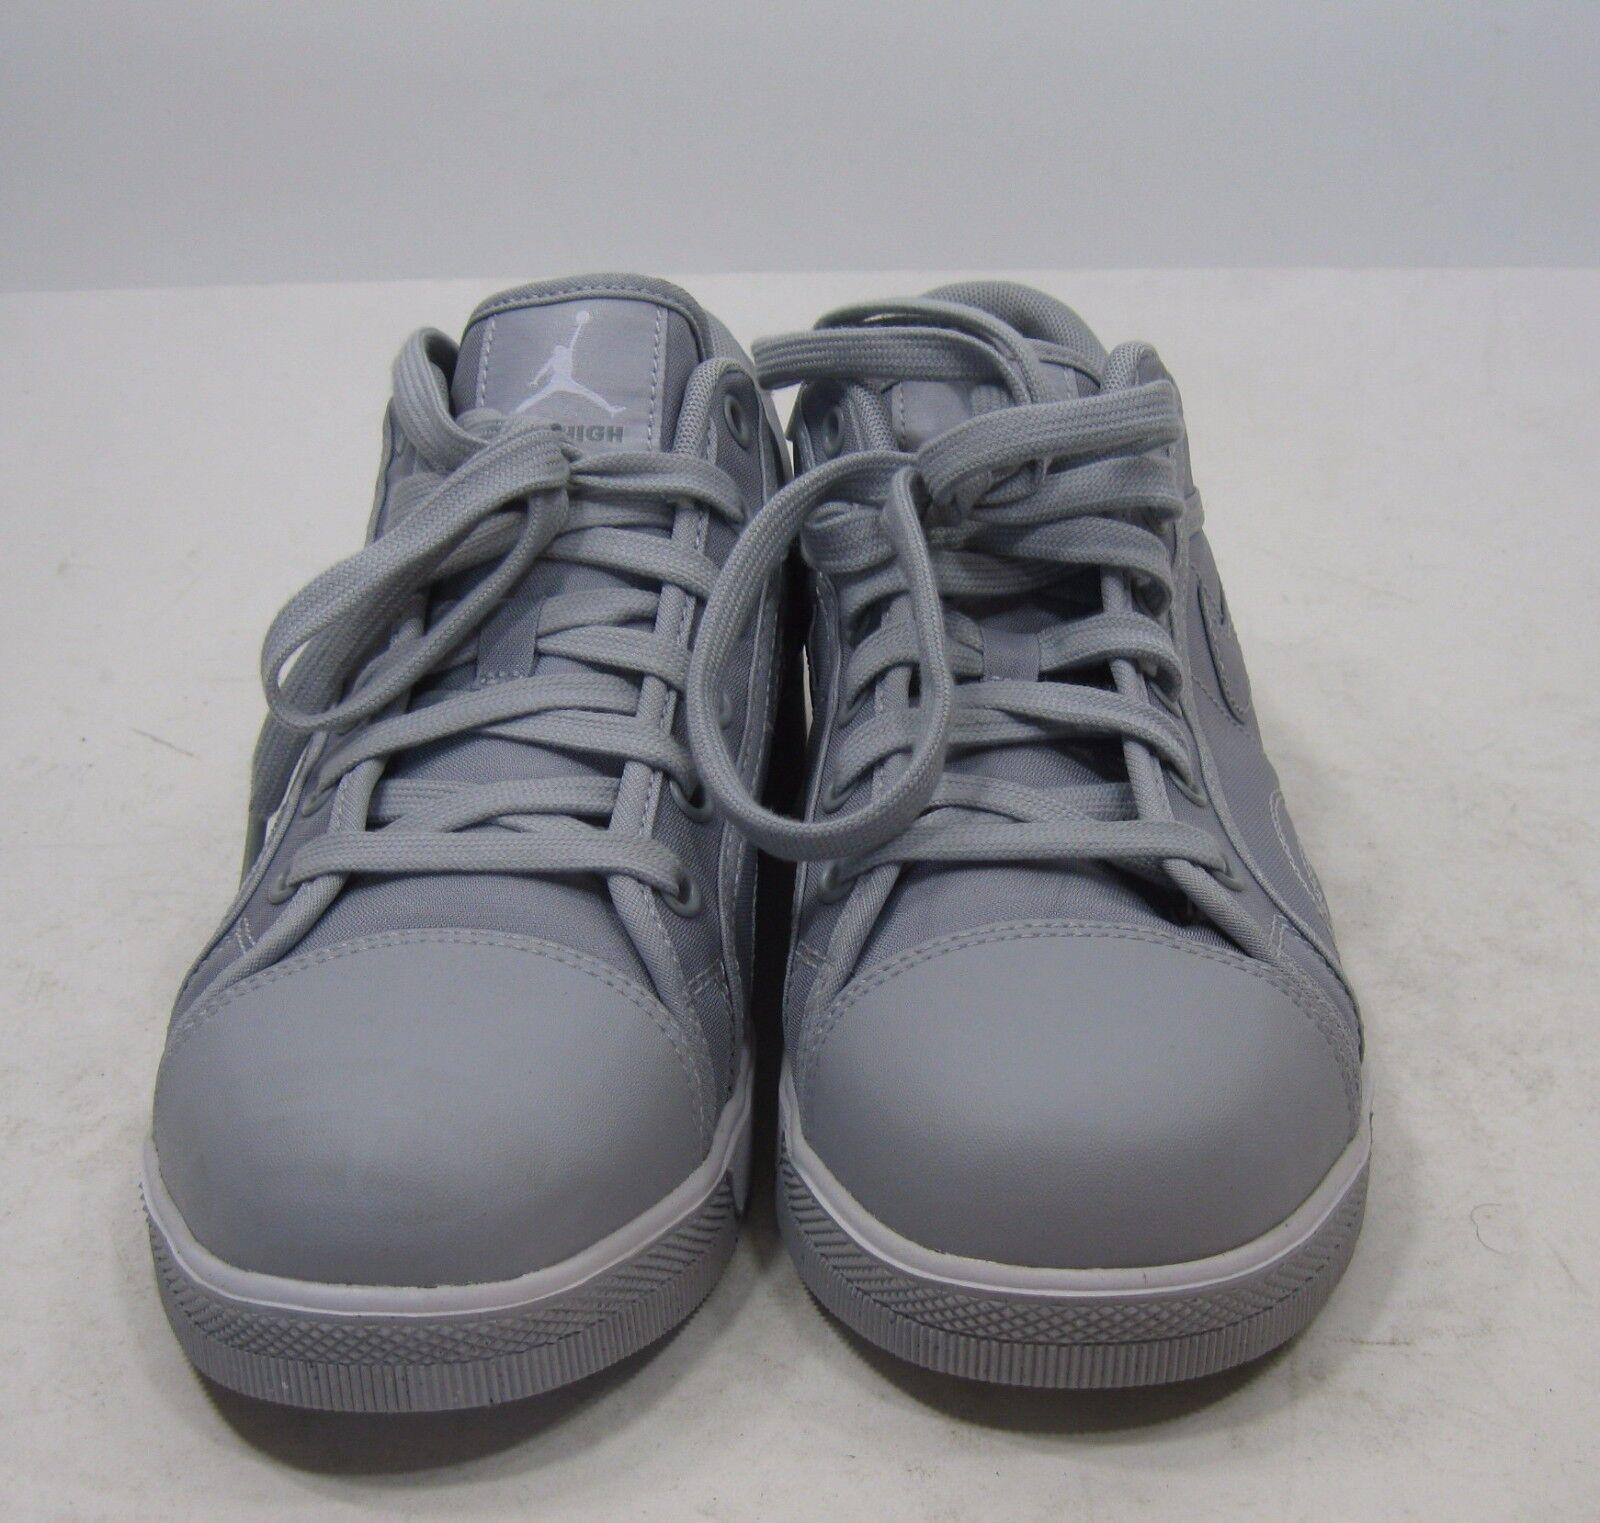 Nike Air Jordan 440988-002 Sky Hommes High Retro Hommes Sky Basketball Chaussures b4d7c6